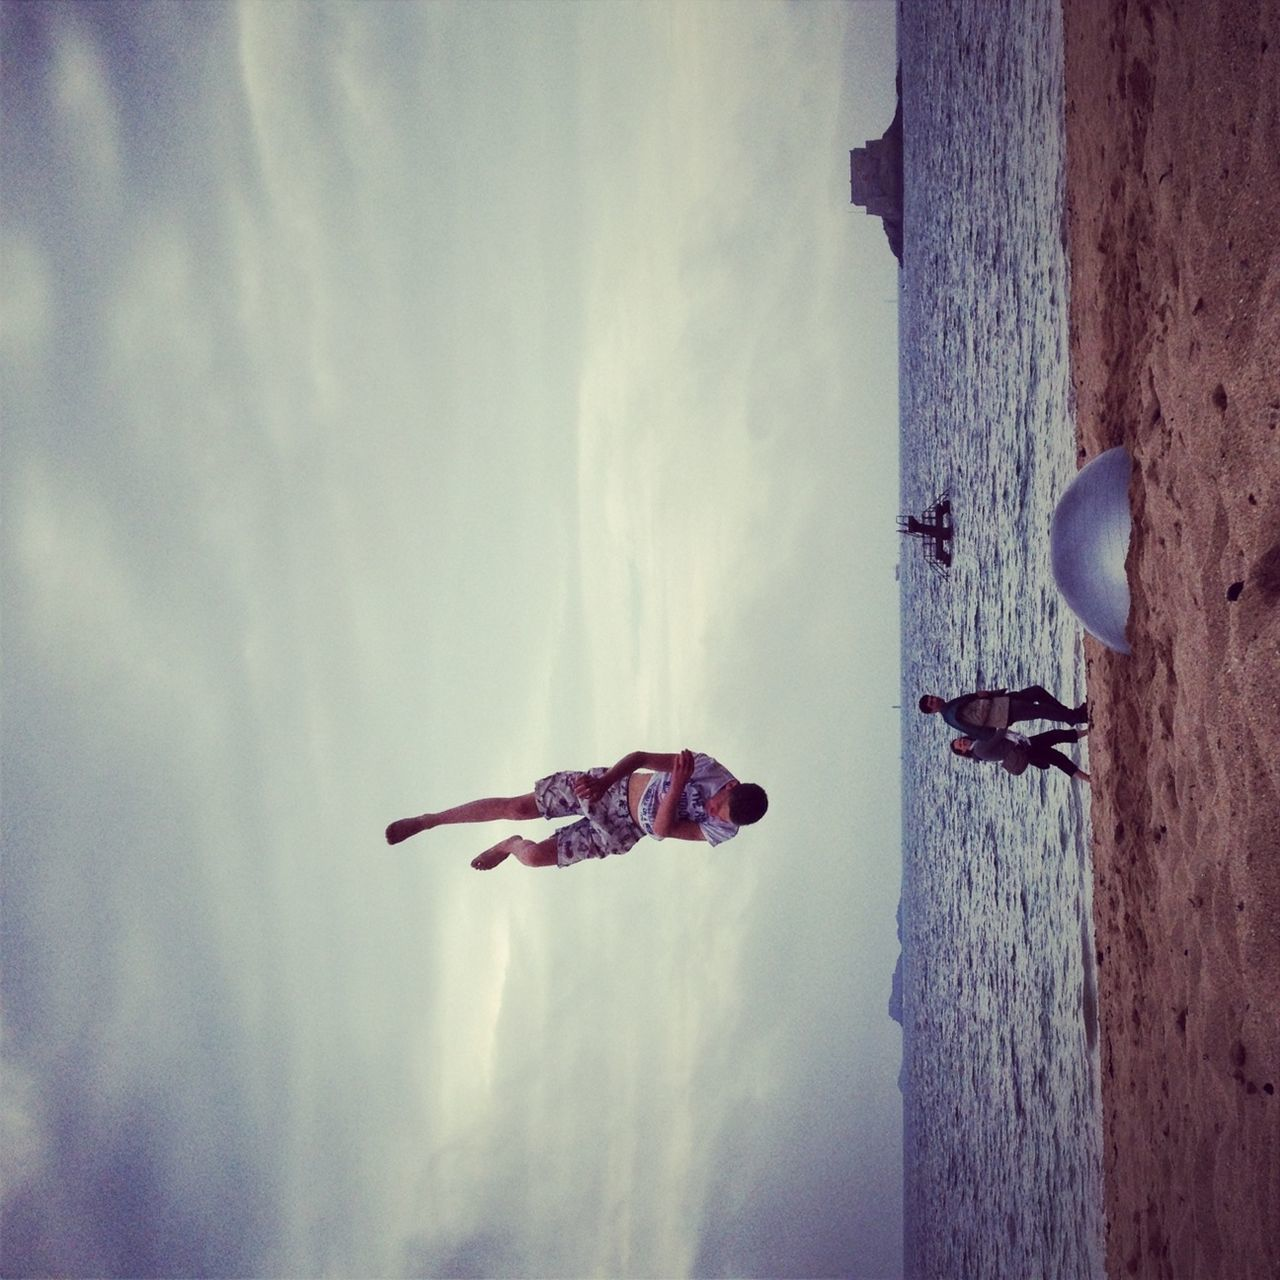 PEOPLE JUMPING IN SEA